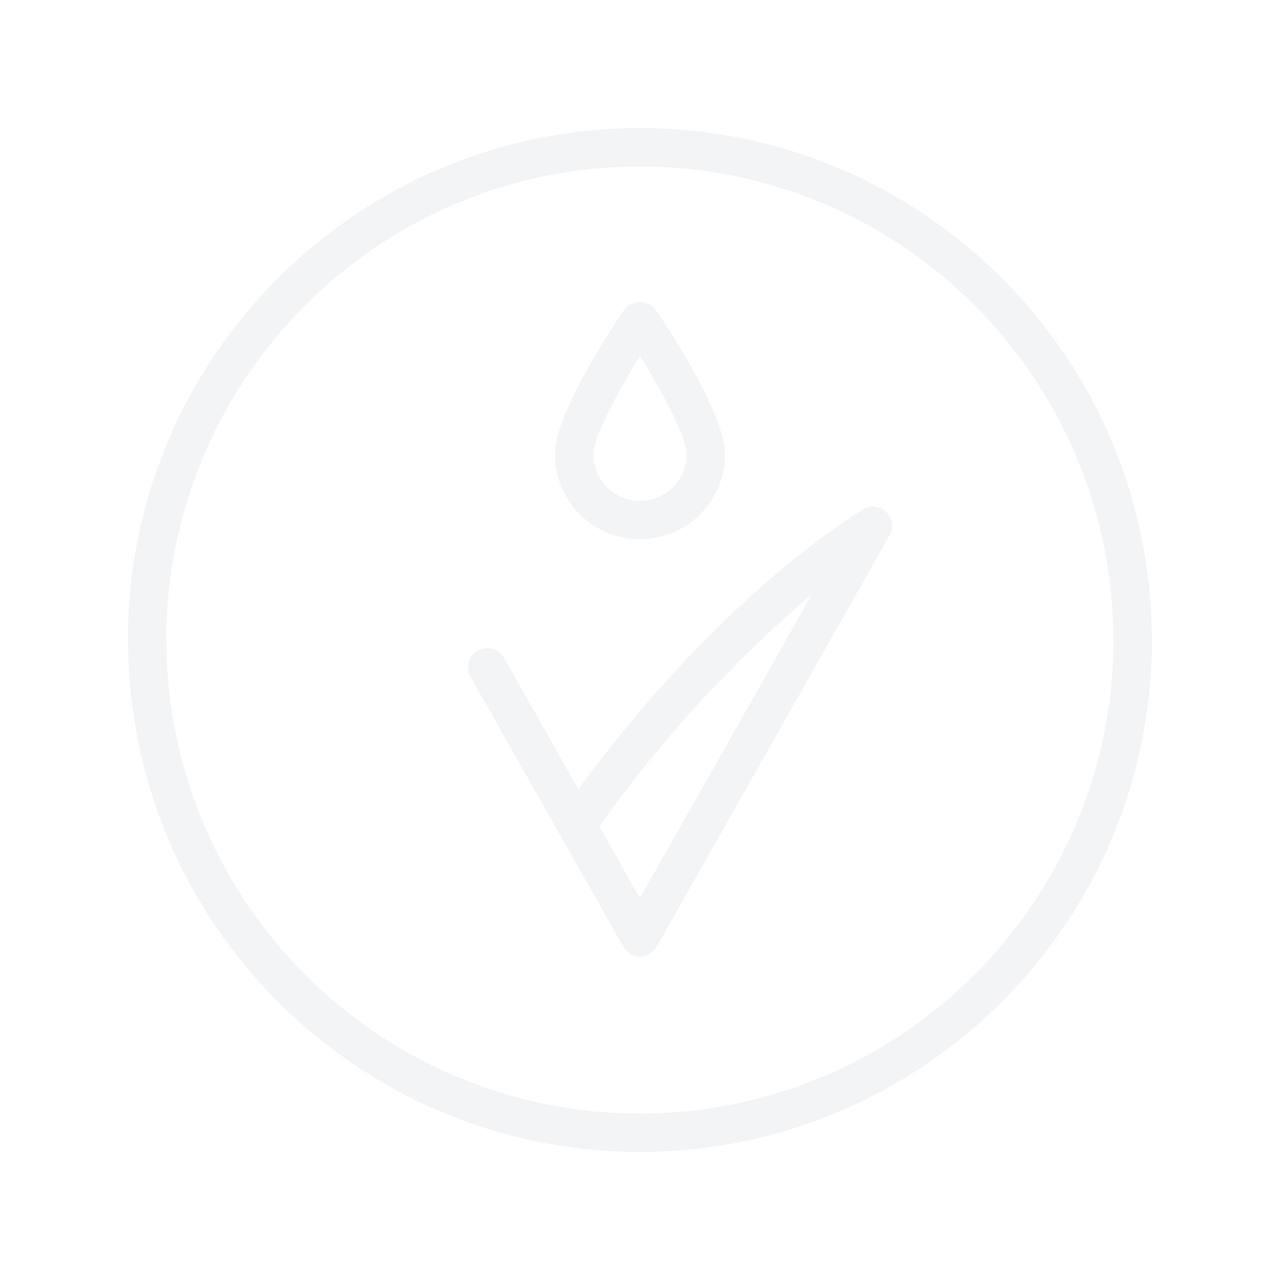 GLO SKIN BEAUTY 107 Contour/Highlighter Brush